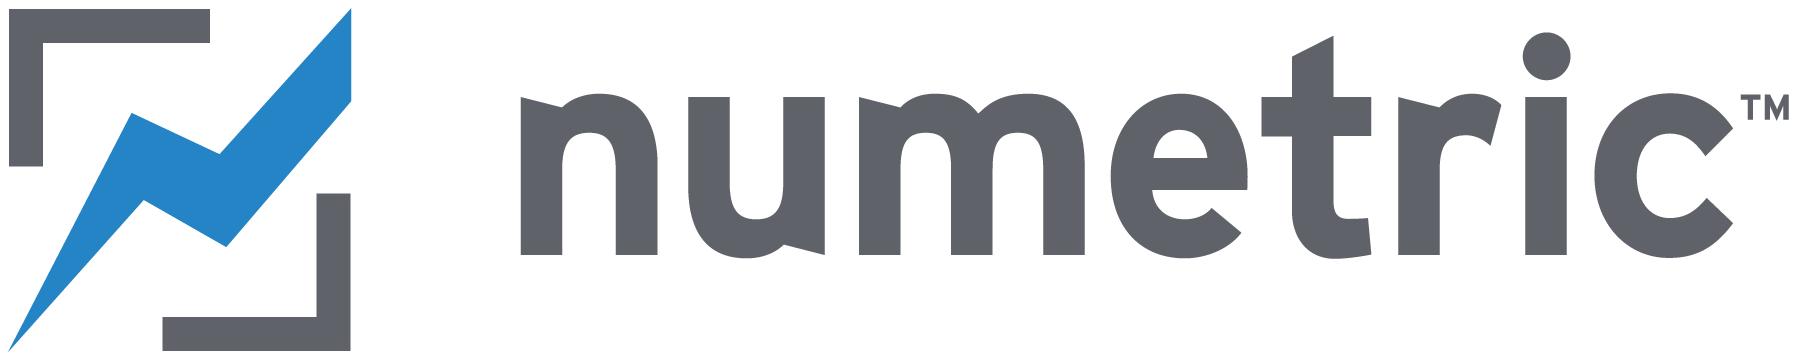 Numetric logo